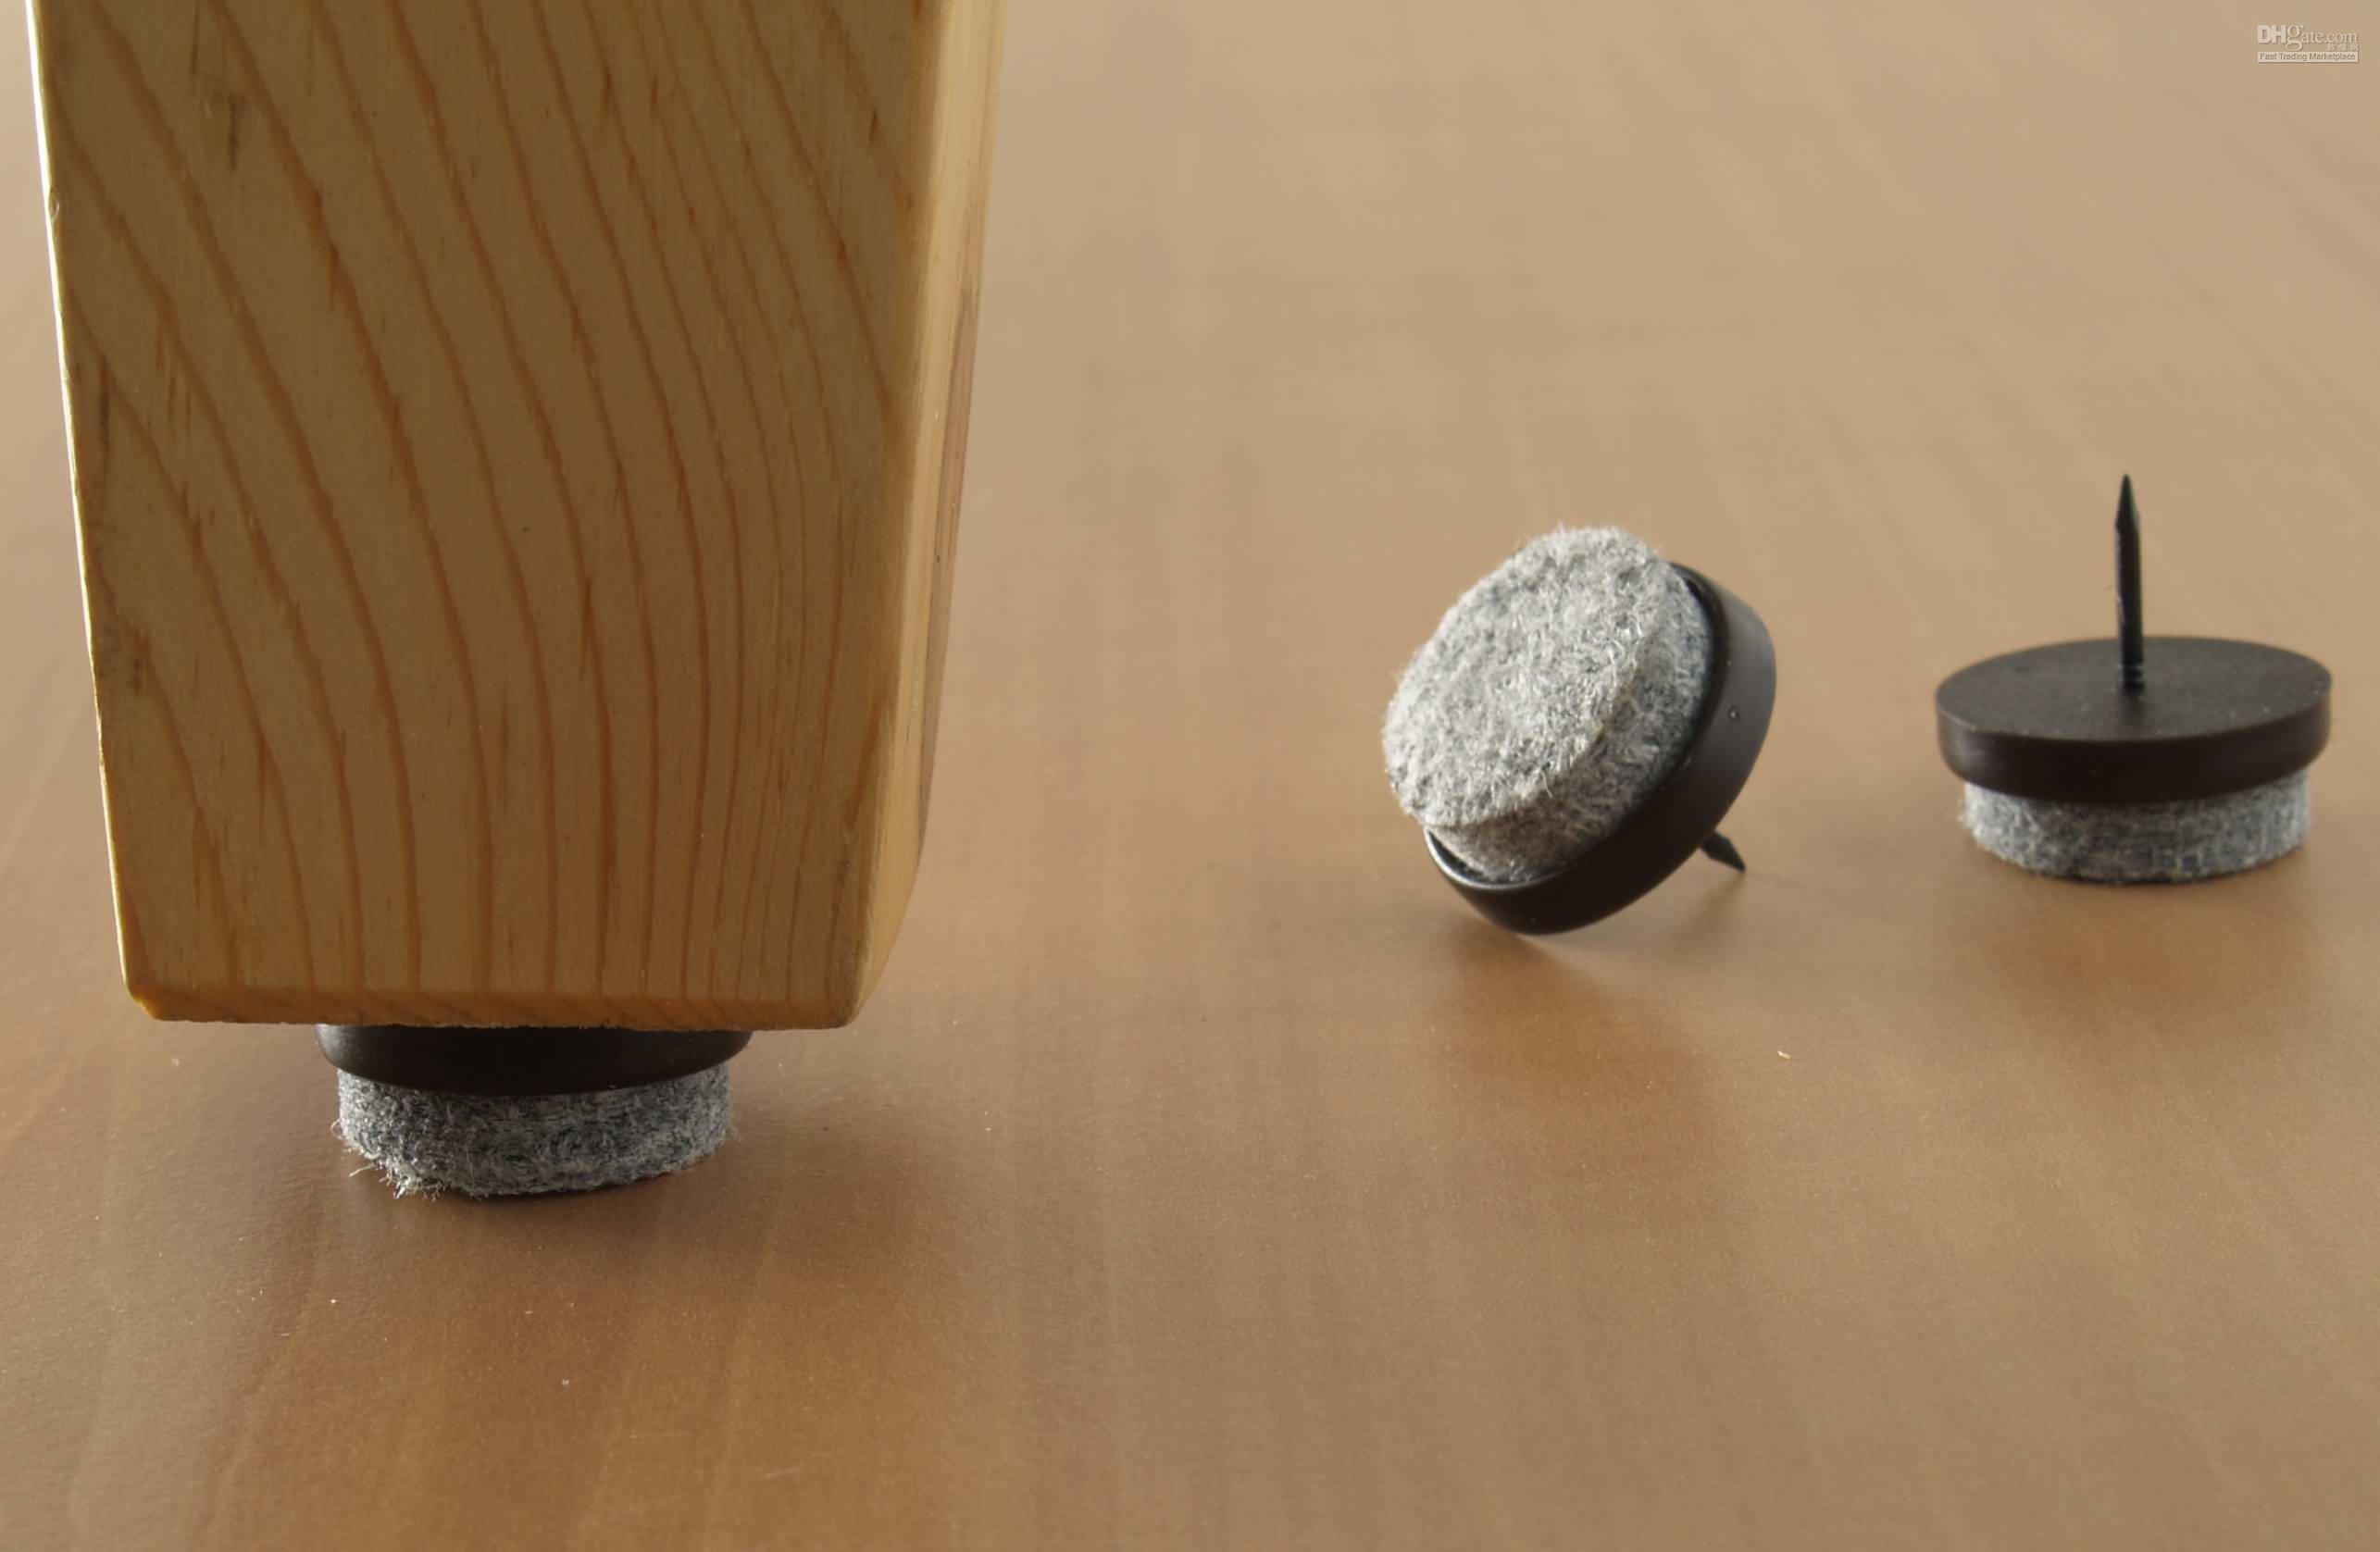 Furniture Pads Protect Hardwood Floors